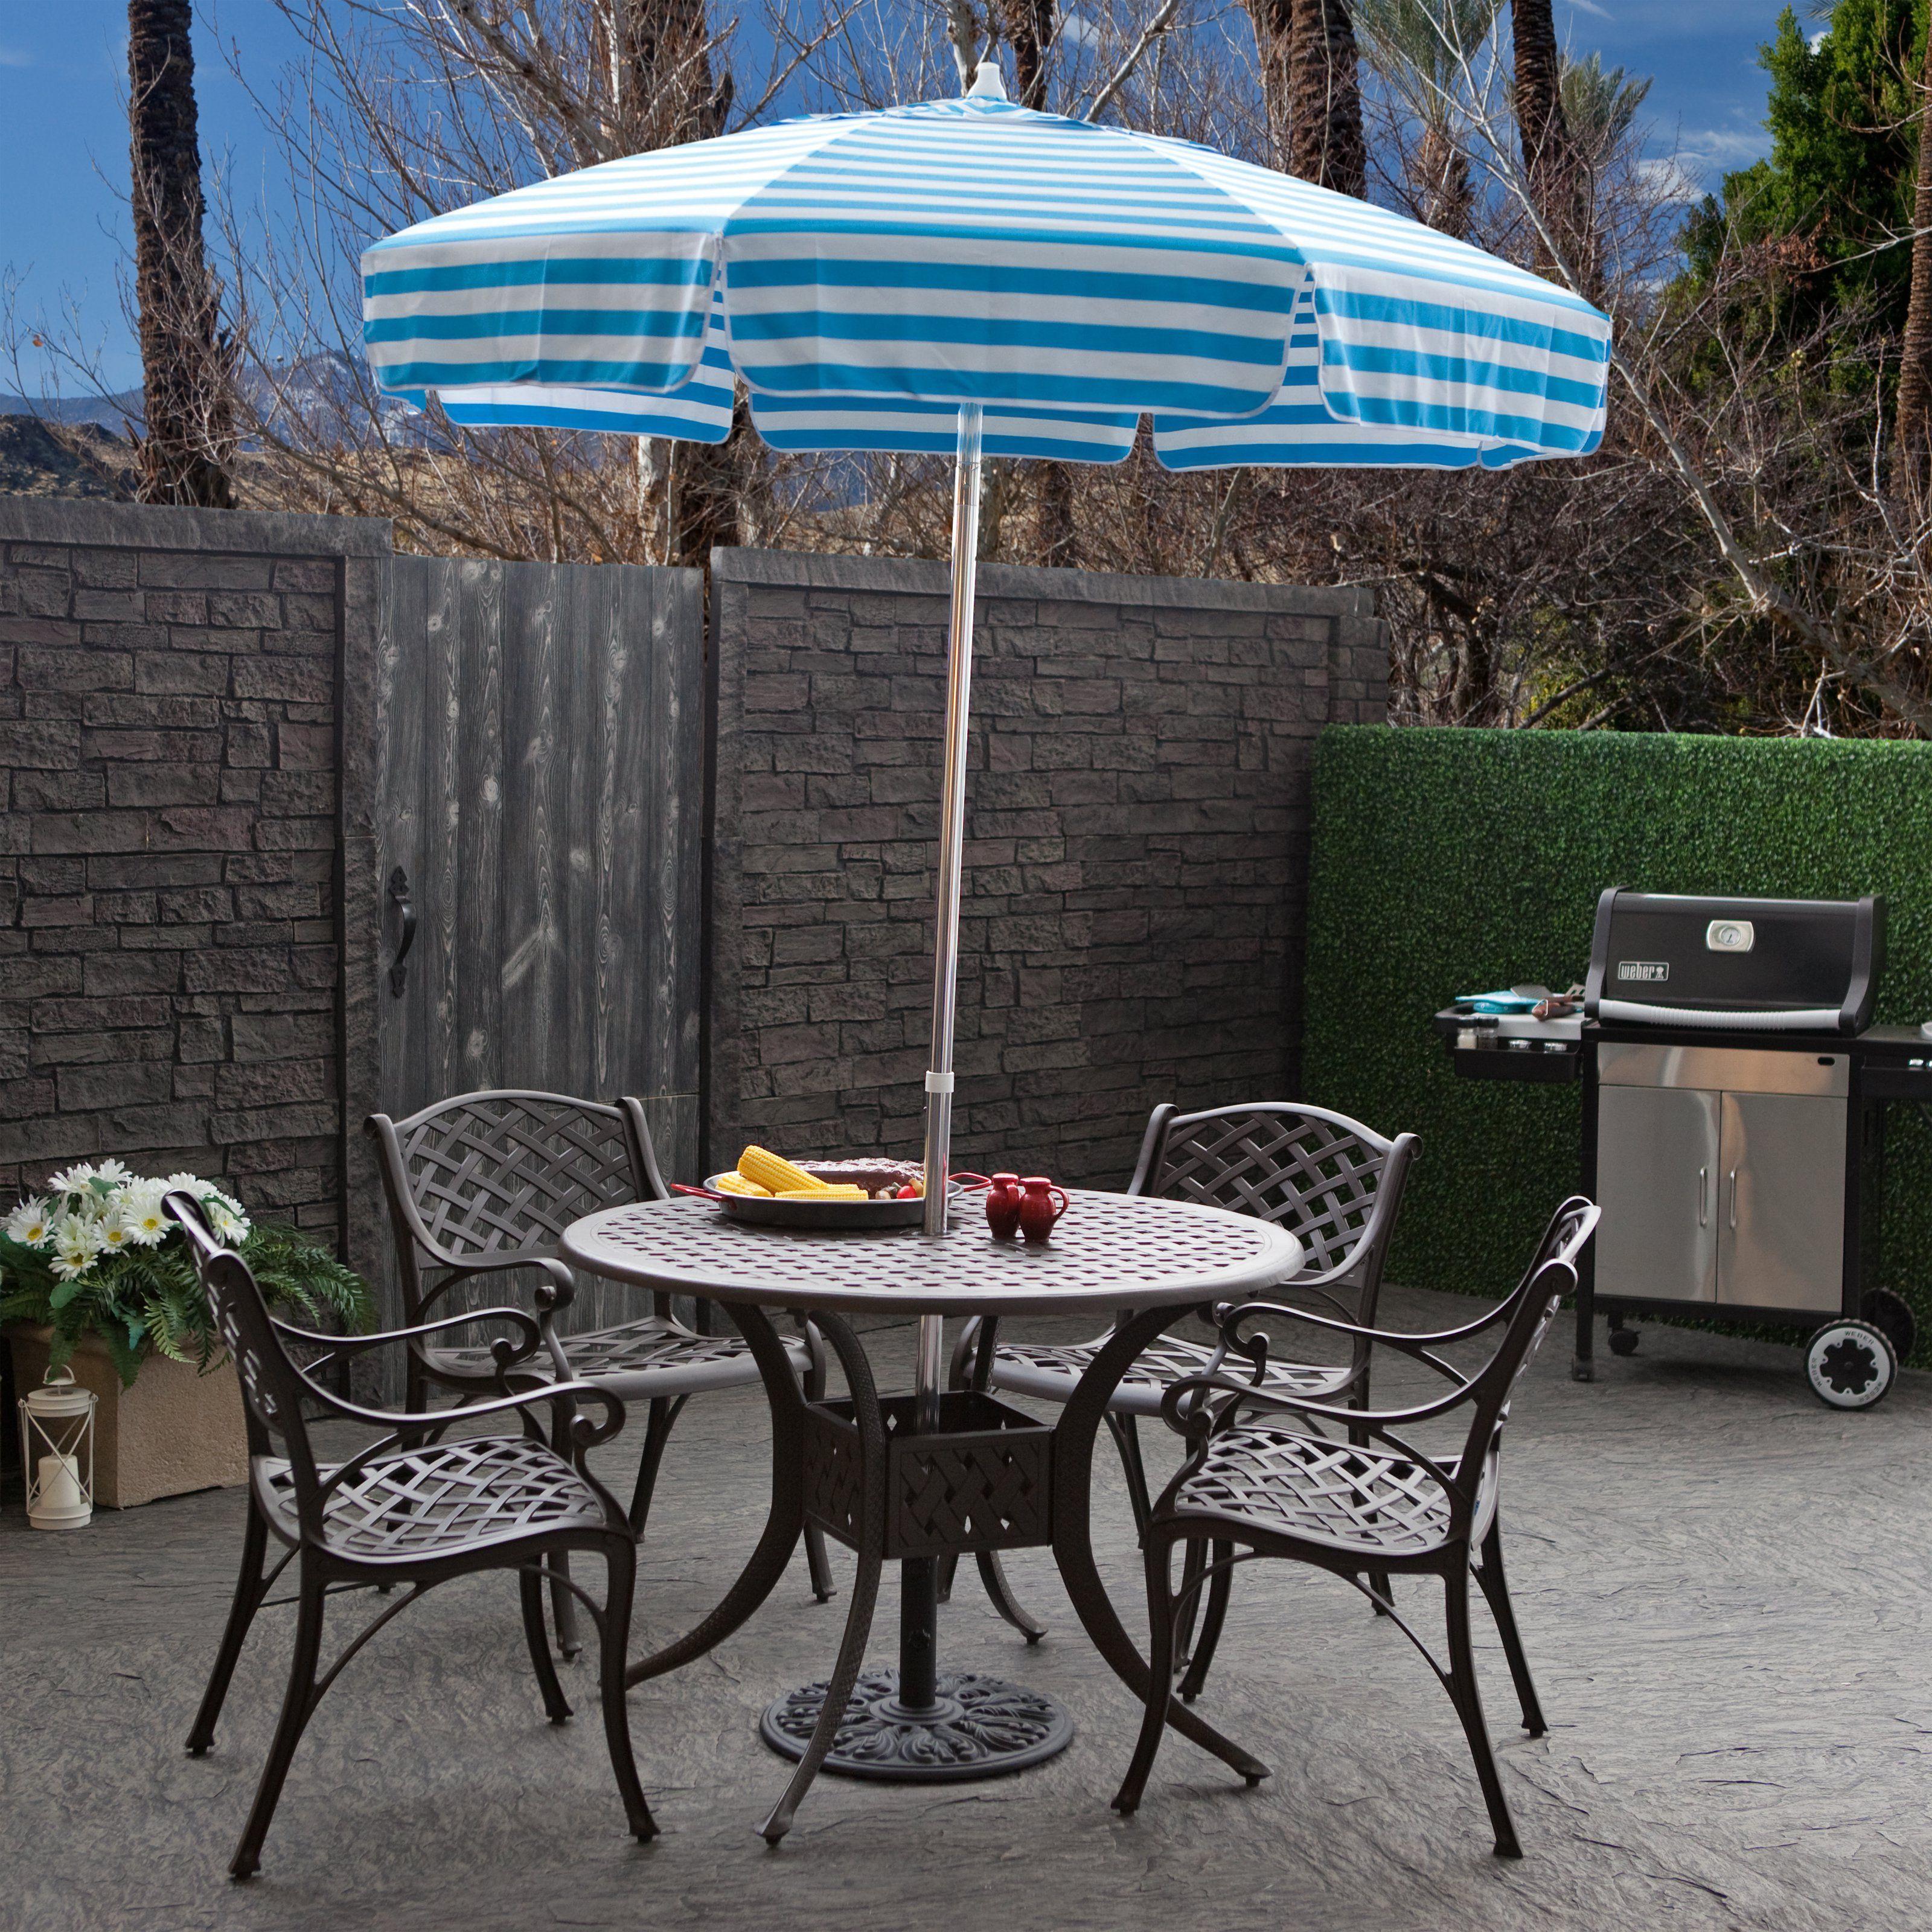 Download Wallpaper Patio Table With Umbrella Walmart